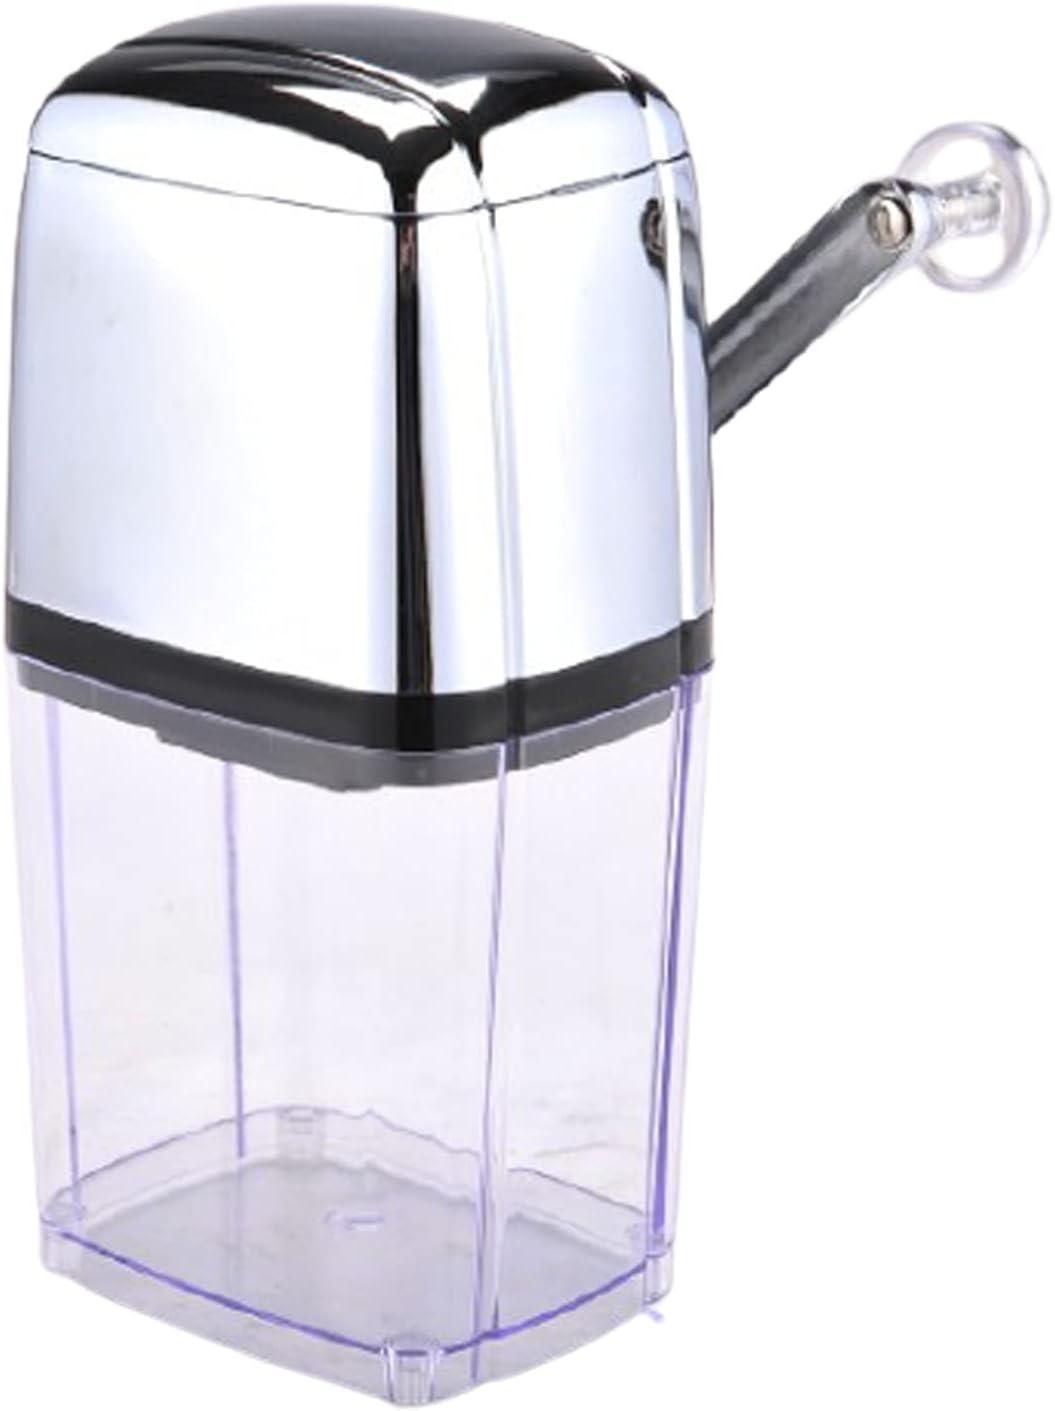 EnweKapu Premium Ice Crusher, Manual Crushed Ice Maschine with Transparent Storage Box, Silver Crushed Ice Maker for Home Bar Kitchen Restaurant